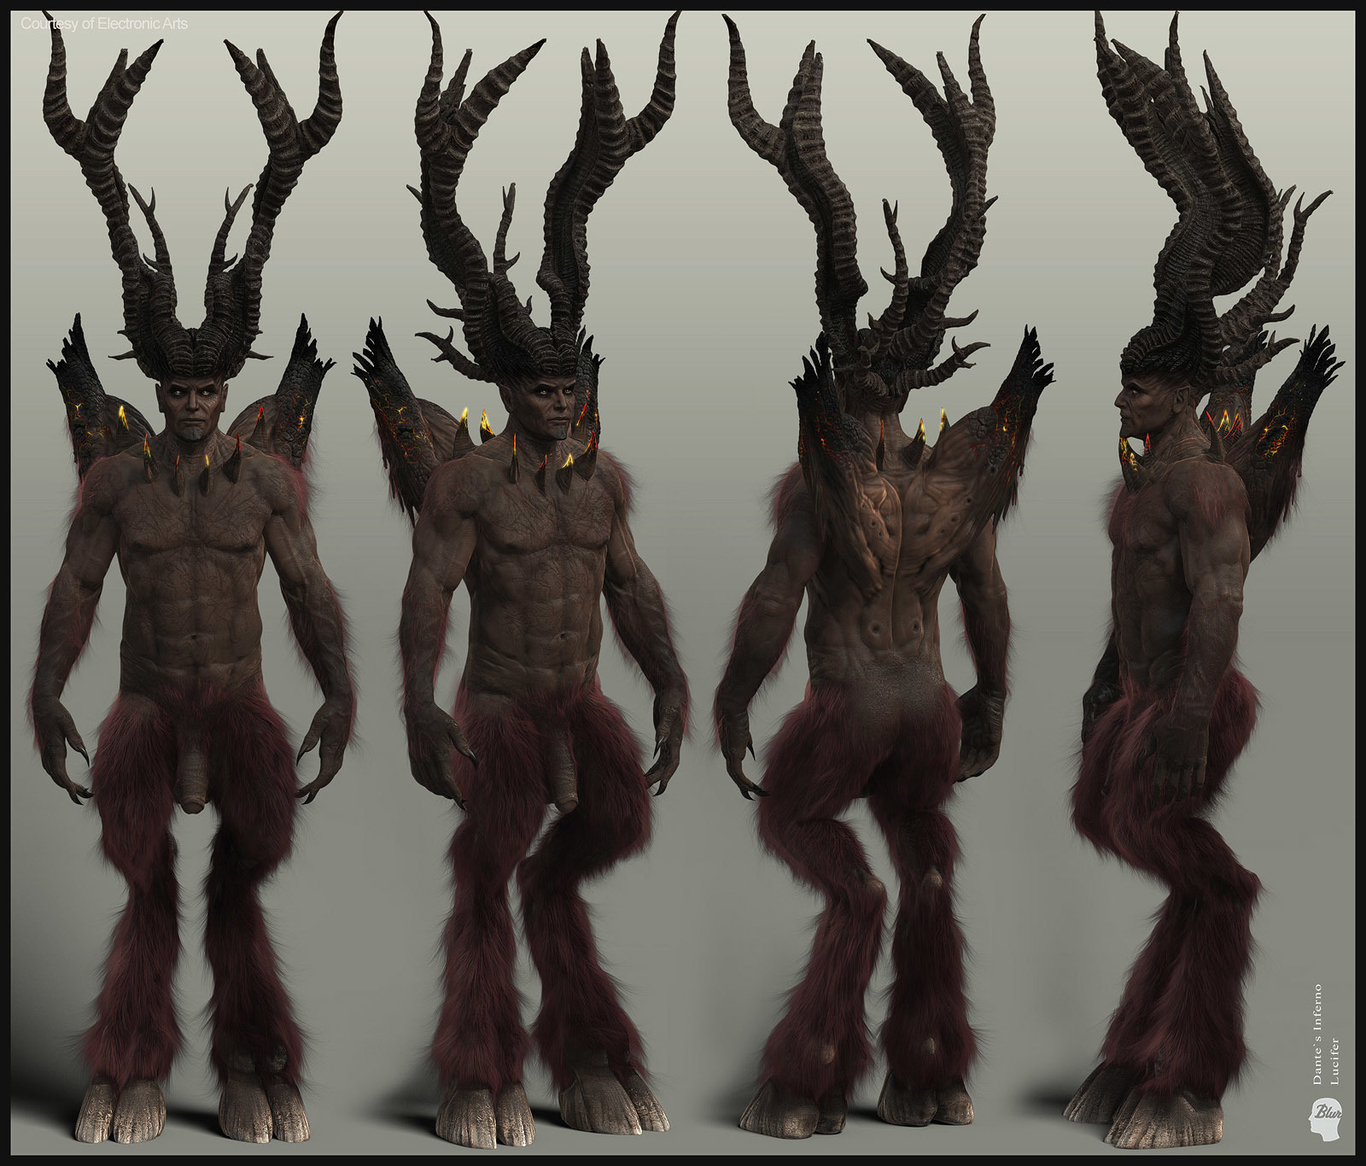 Lucifer Dante S Inferno By Baldasseroni 3d Cgsociety